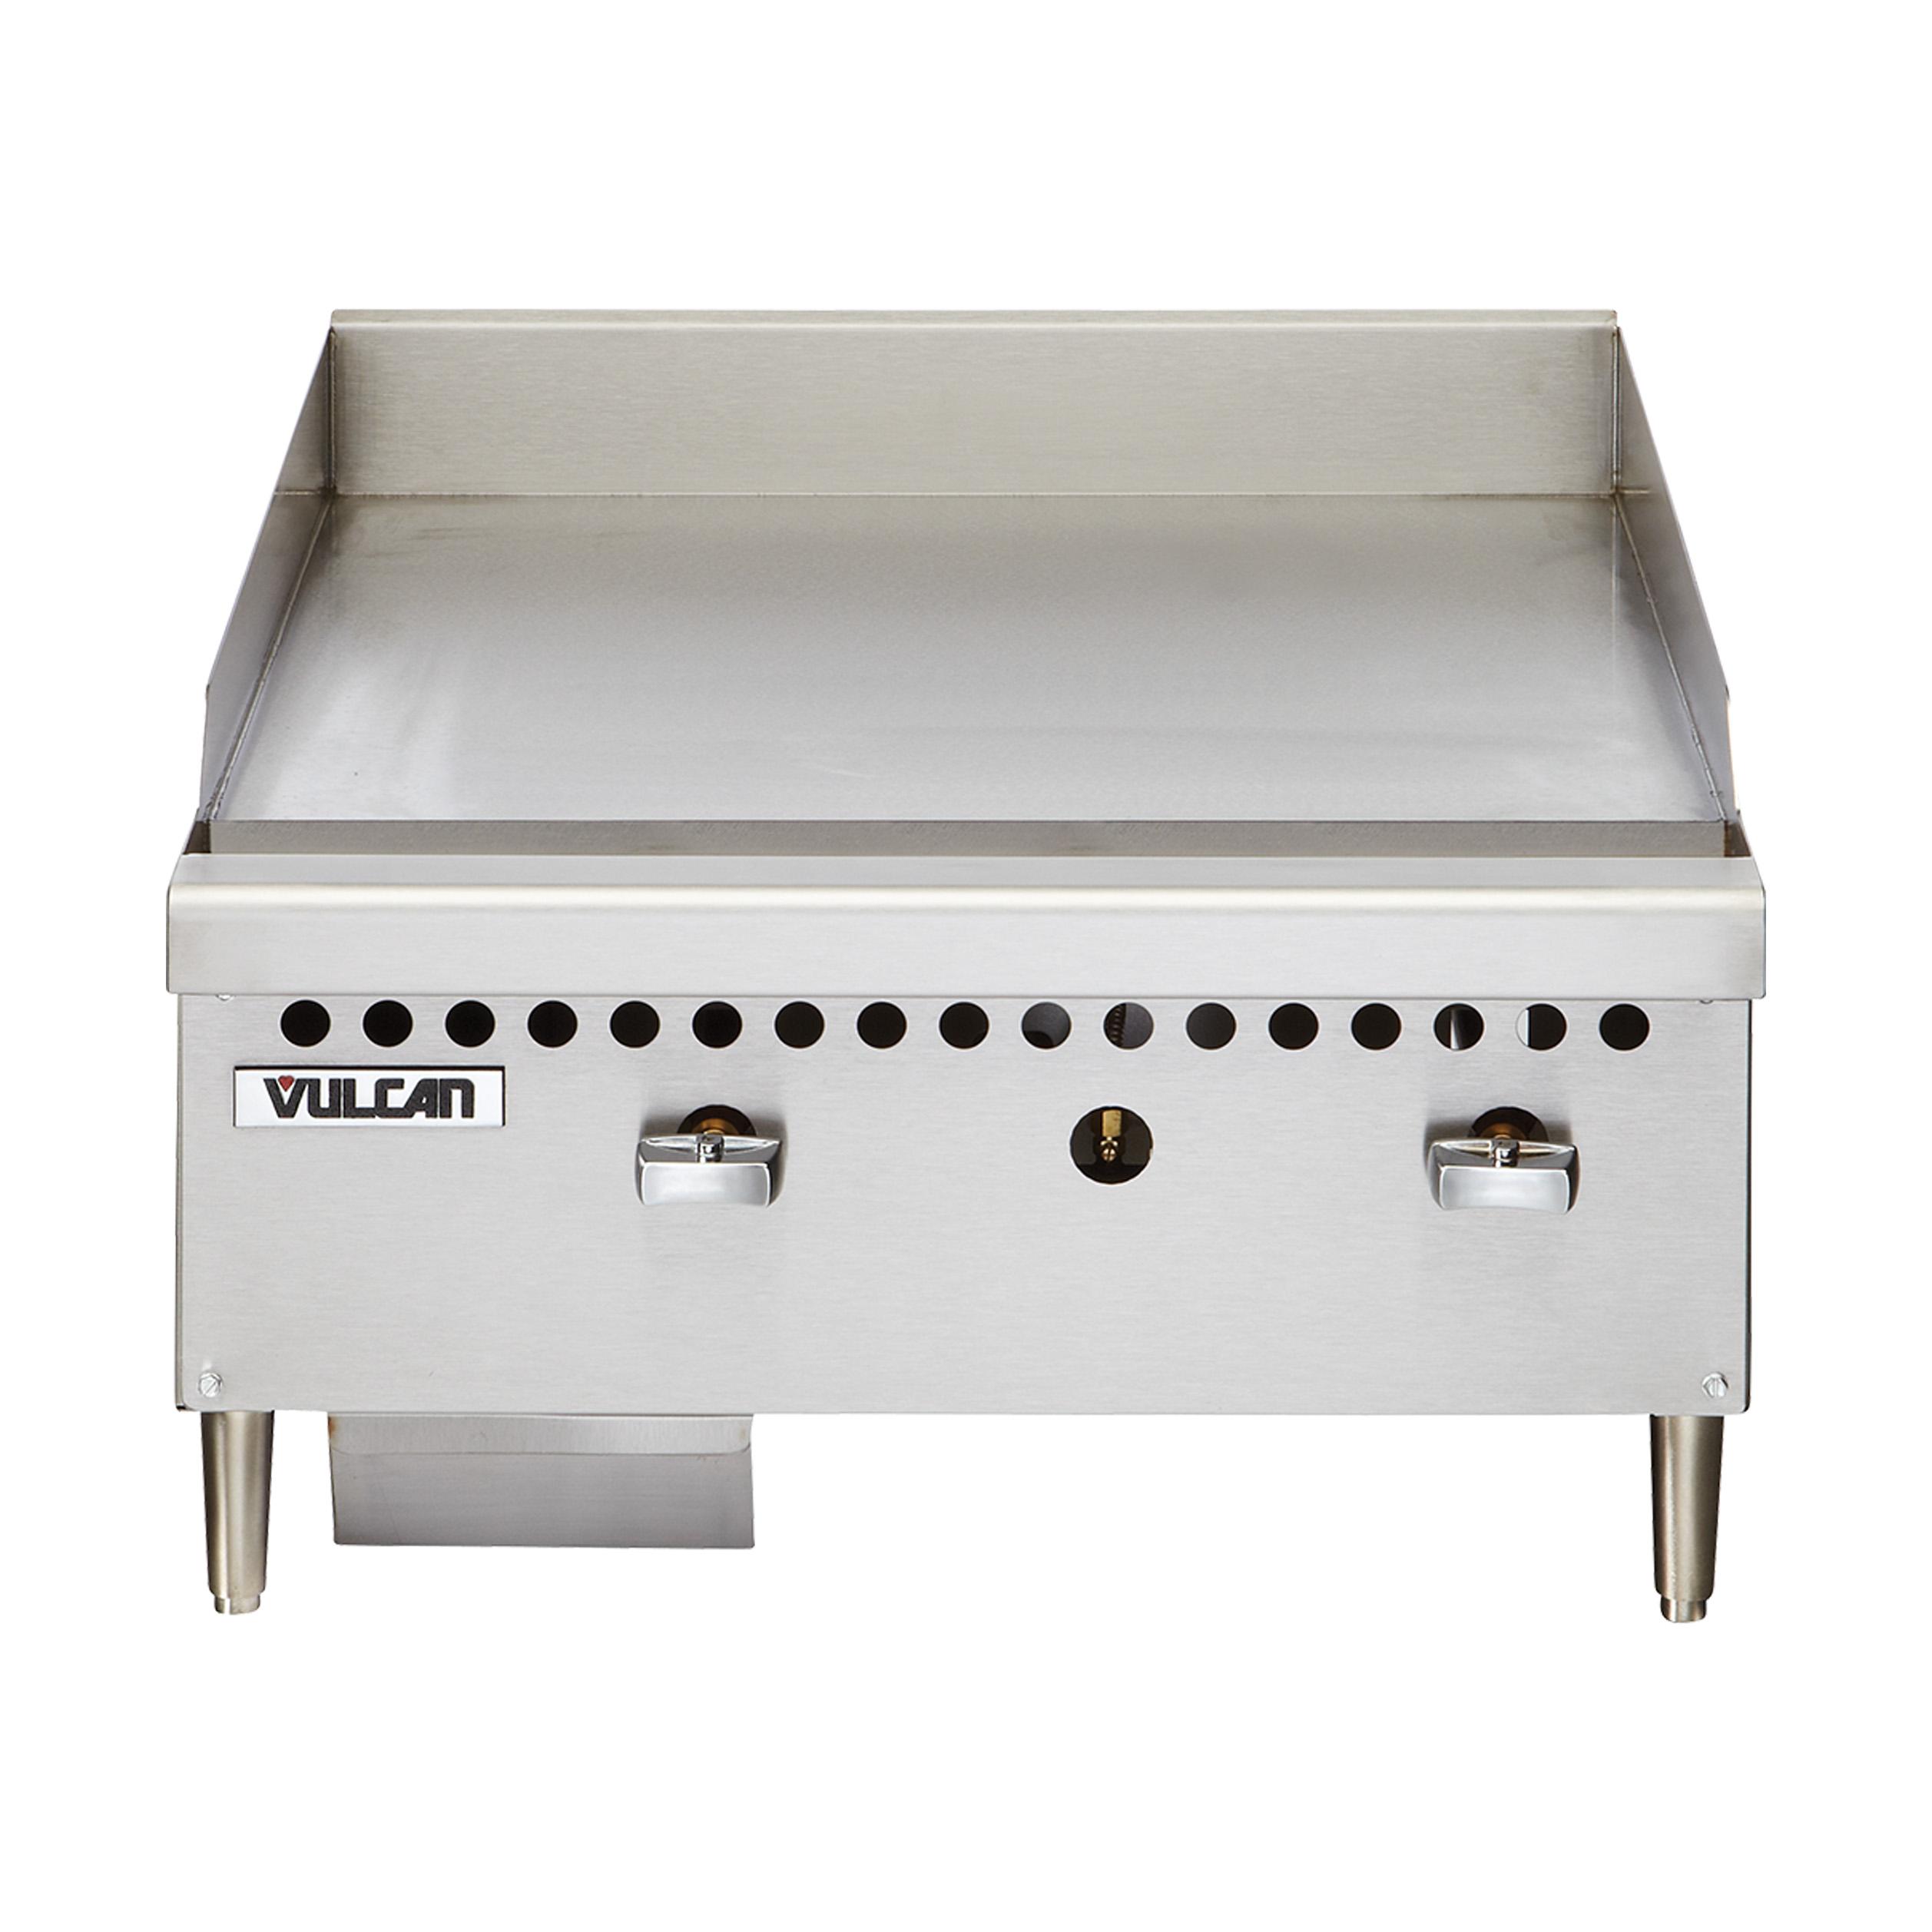 VCRG24-M Vulcan griddle, gas, countertop